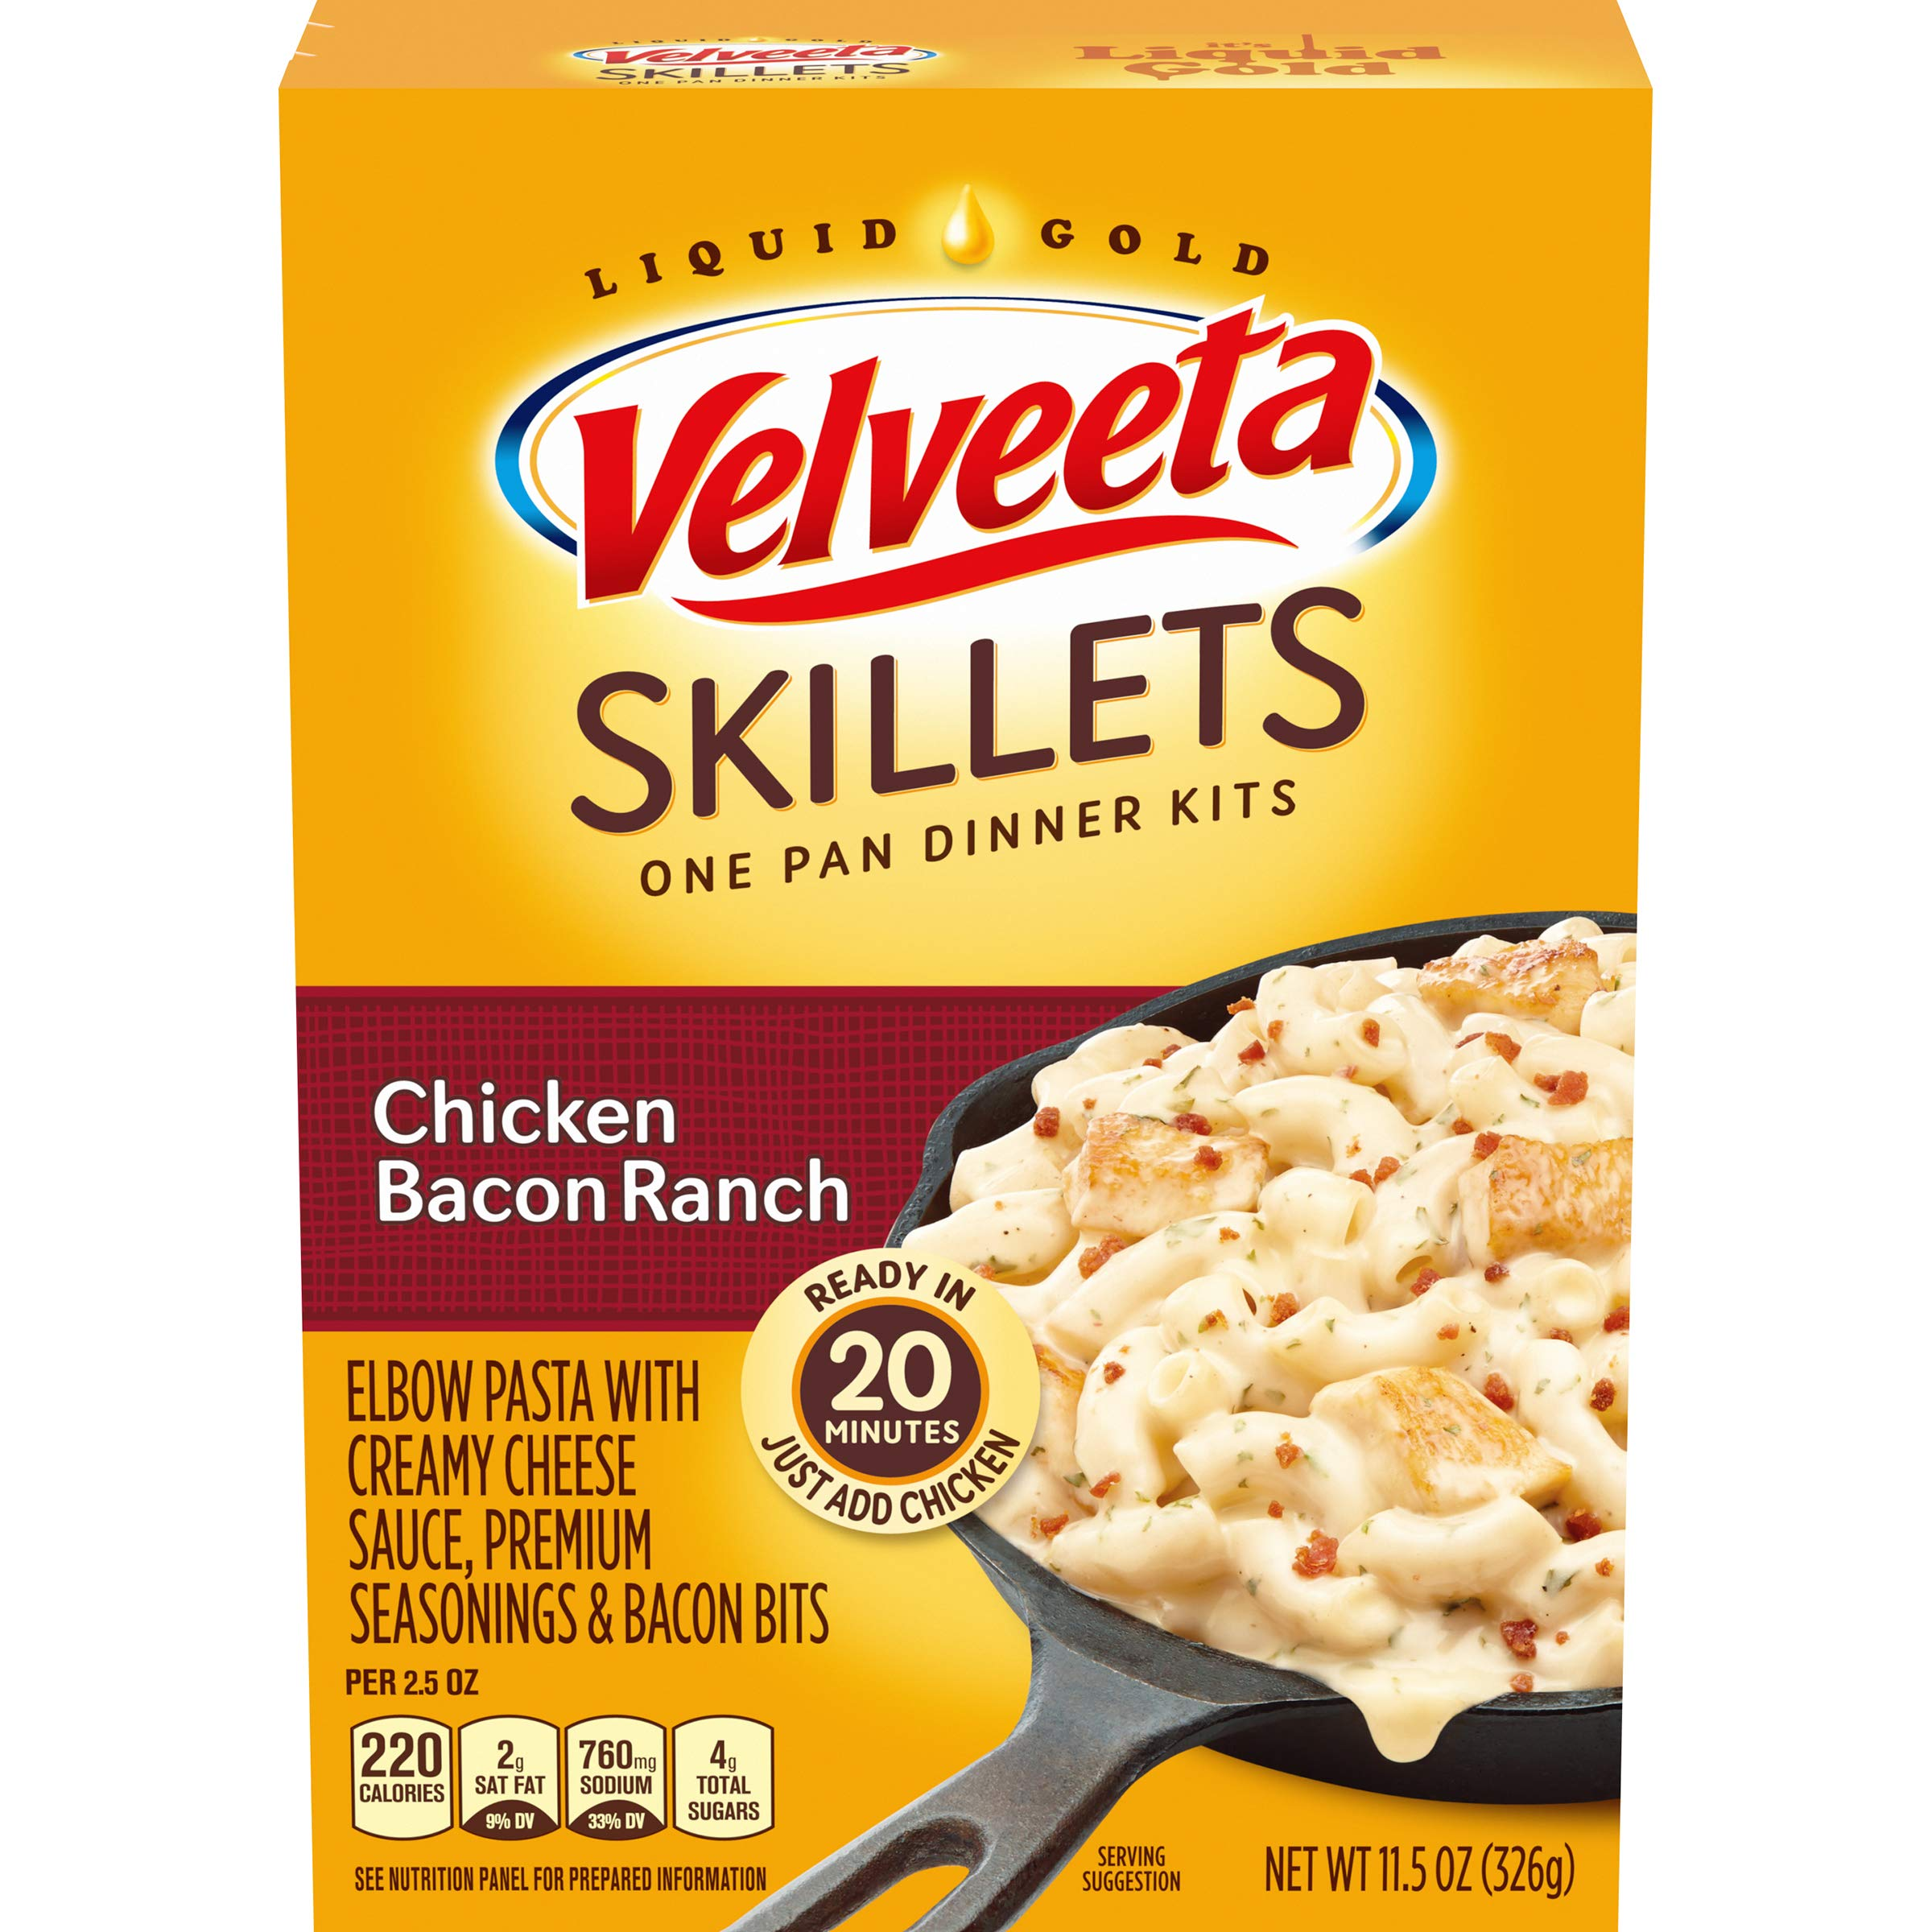 Velveeta Cheesy Skillets Chicken Bacon Ranch Meal Kit (11.5 oz Box)